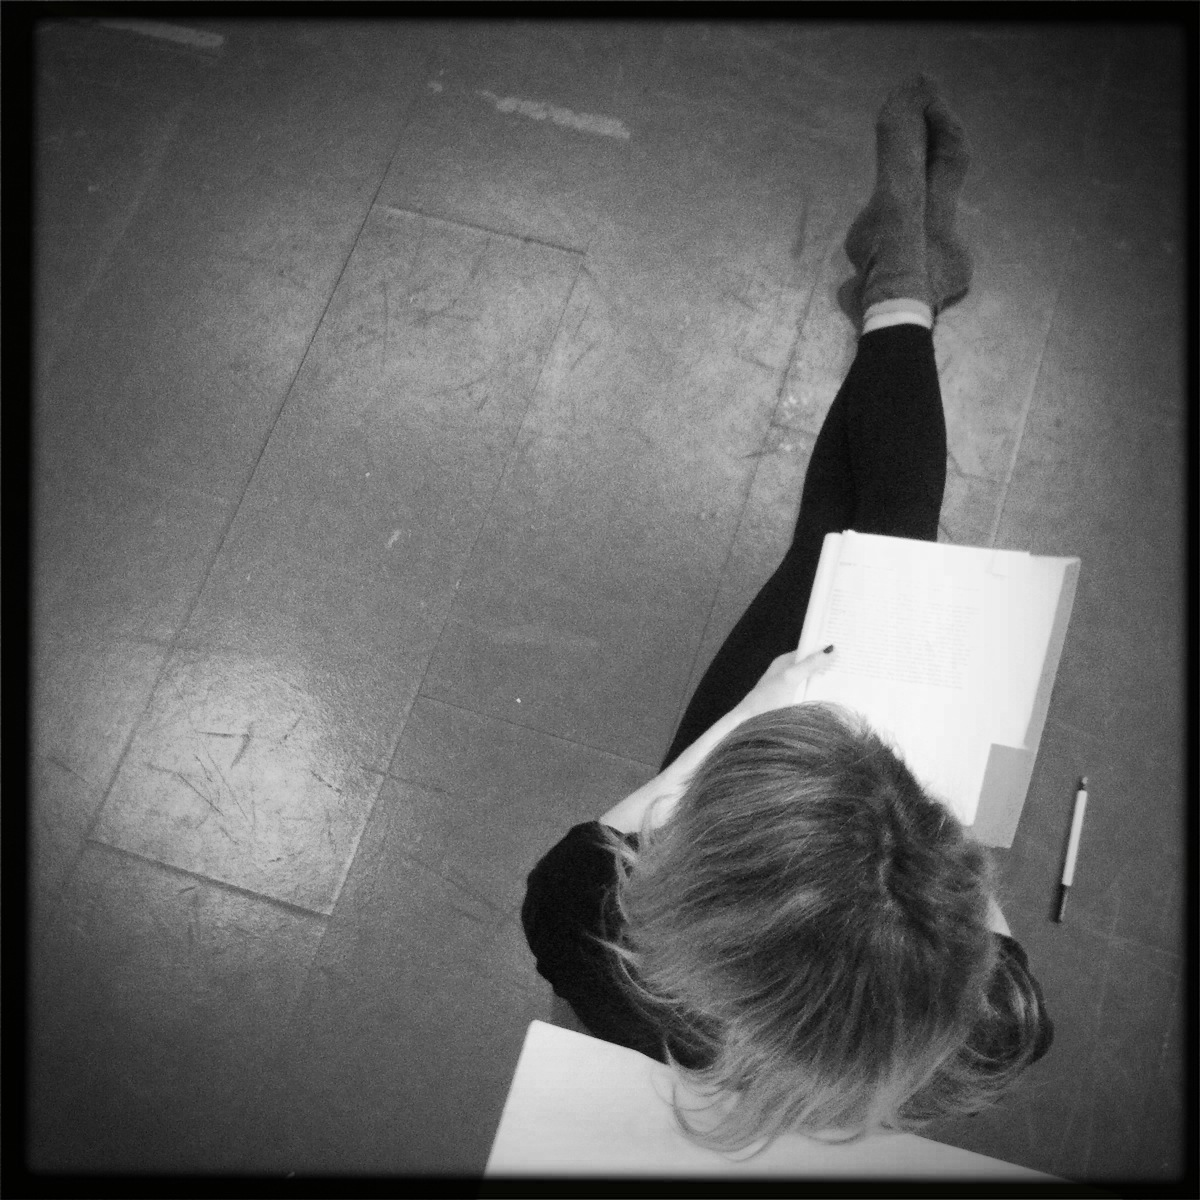 Yippie! rehearsal, 2011